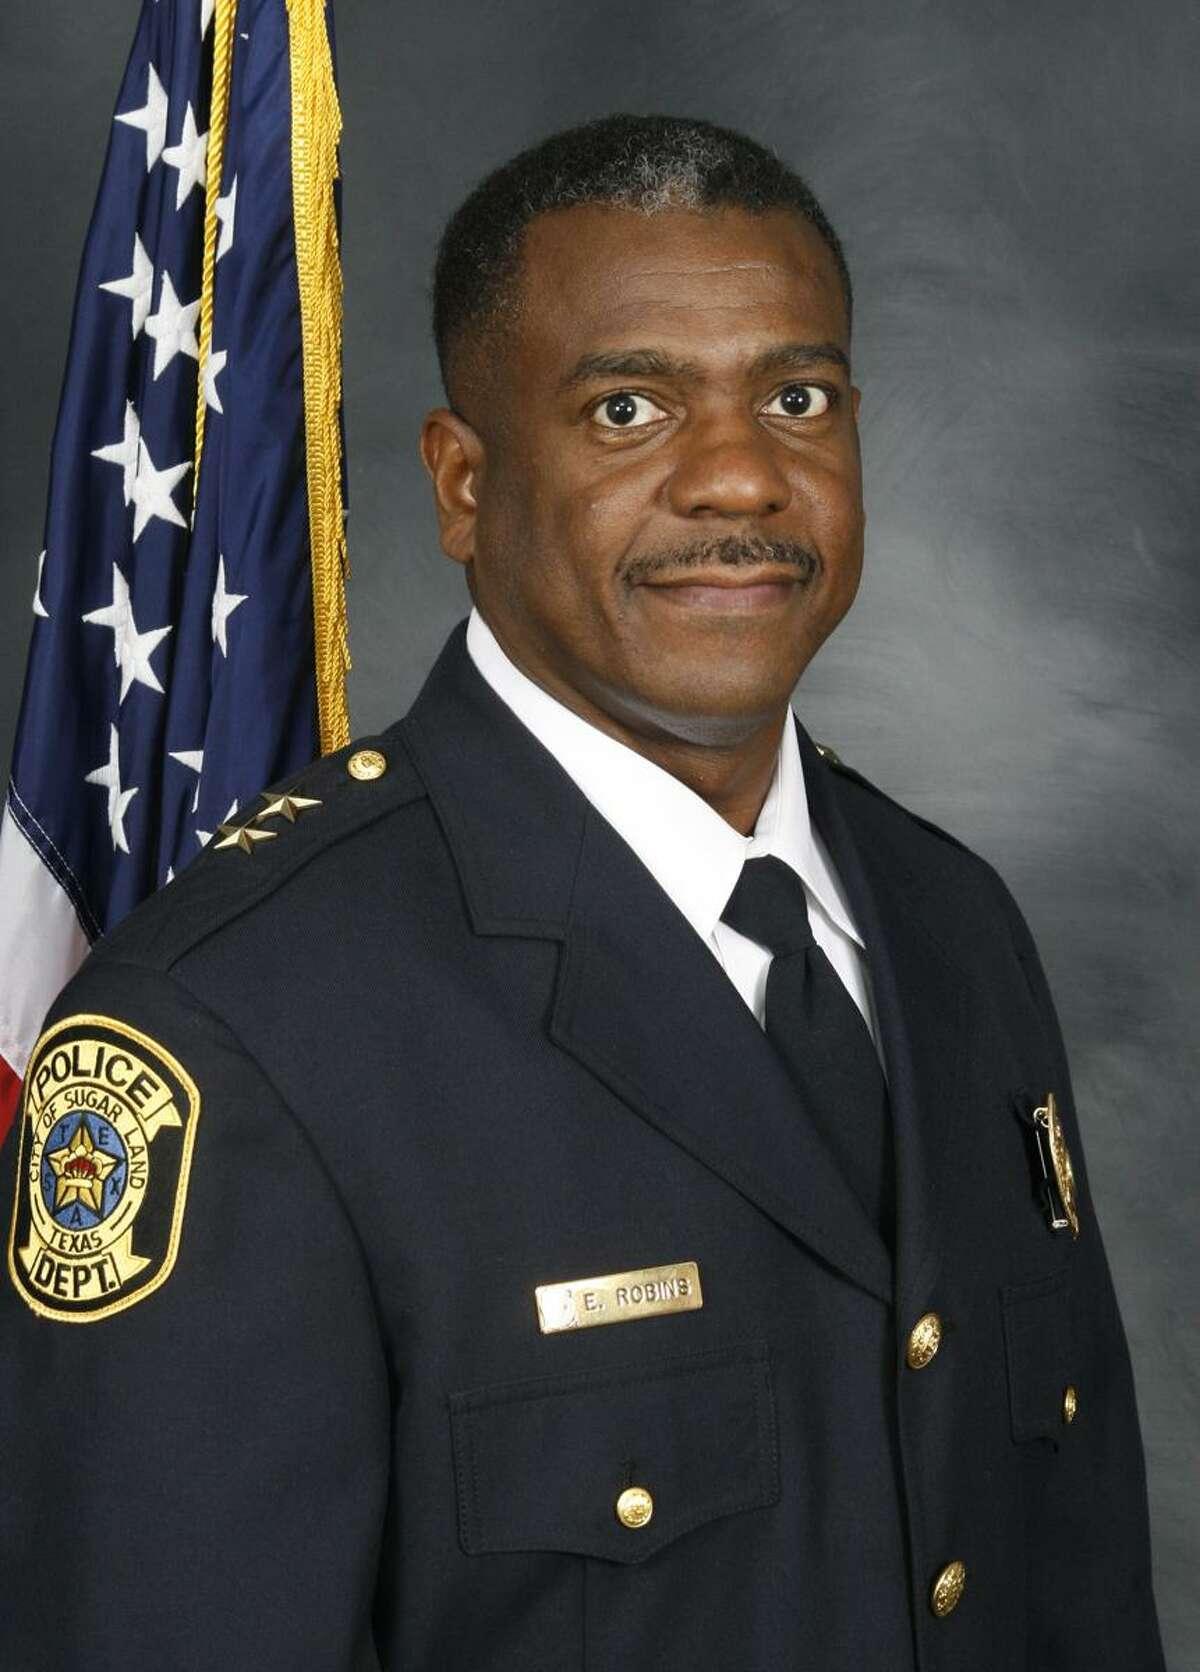 Sugar Land Police Chief Eric Robins